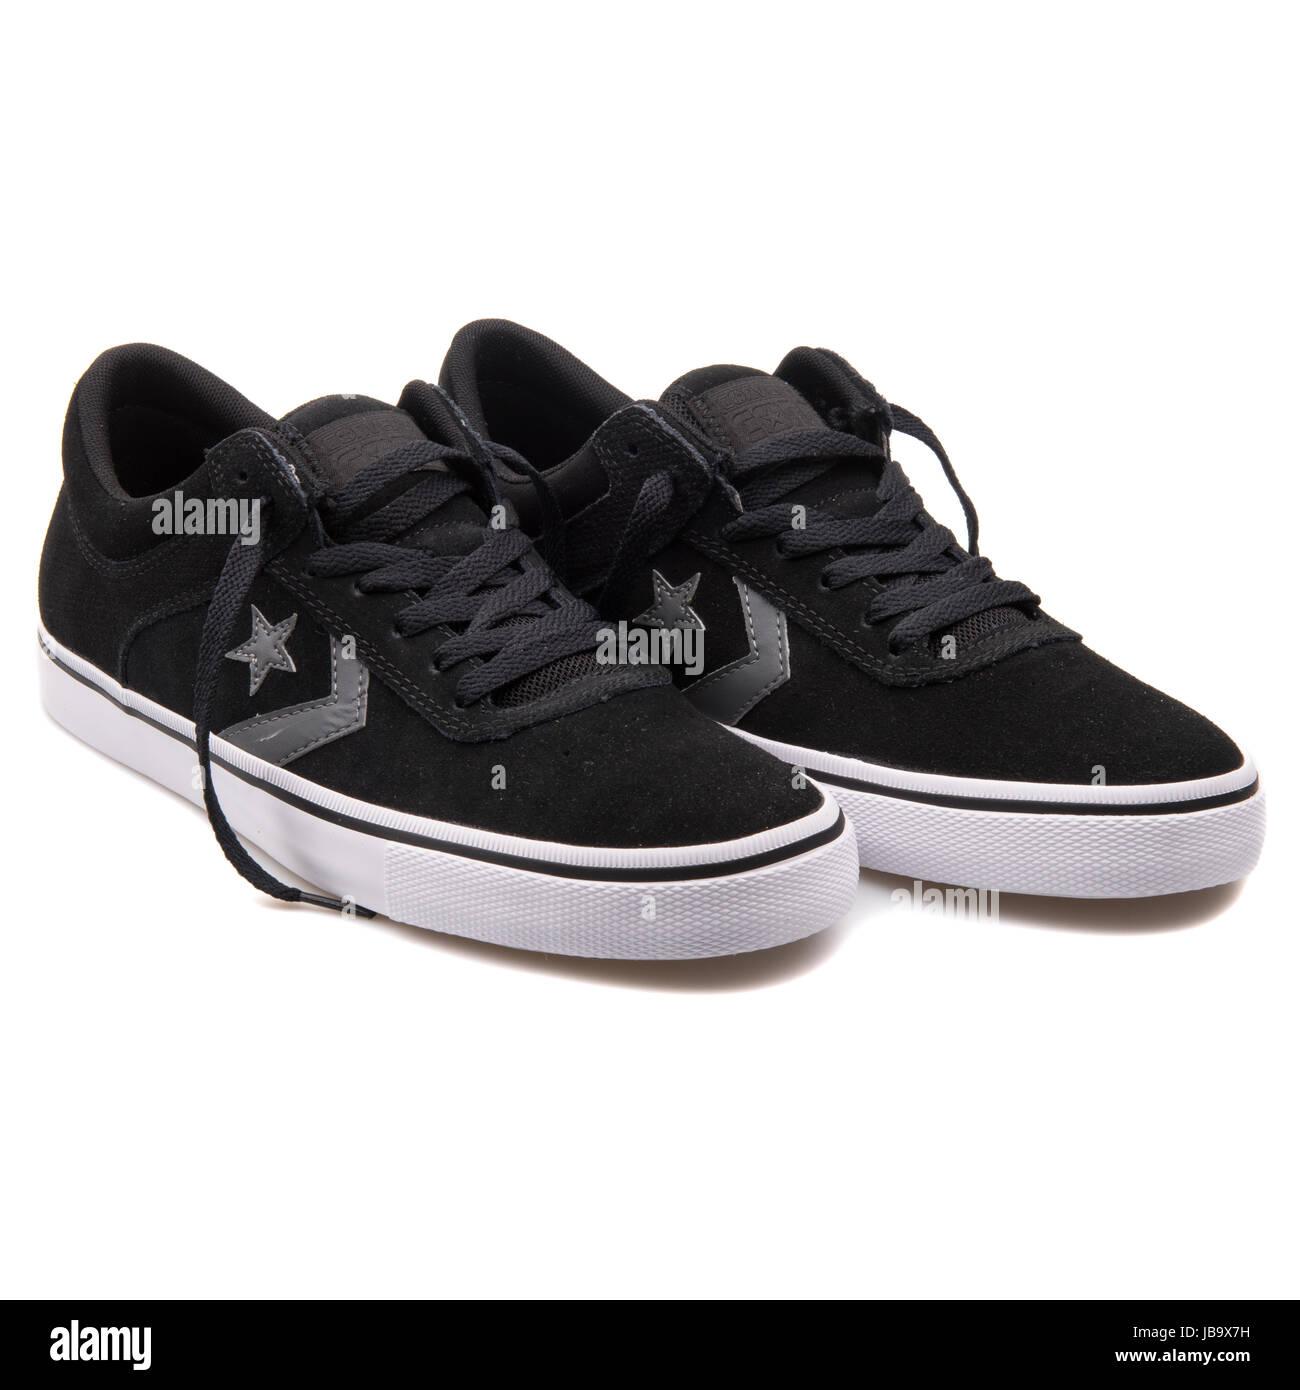 Converse Chuck Taylor All Star Aero S OX Black Unisex Shoes - 150431C - Stock Image